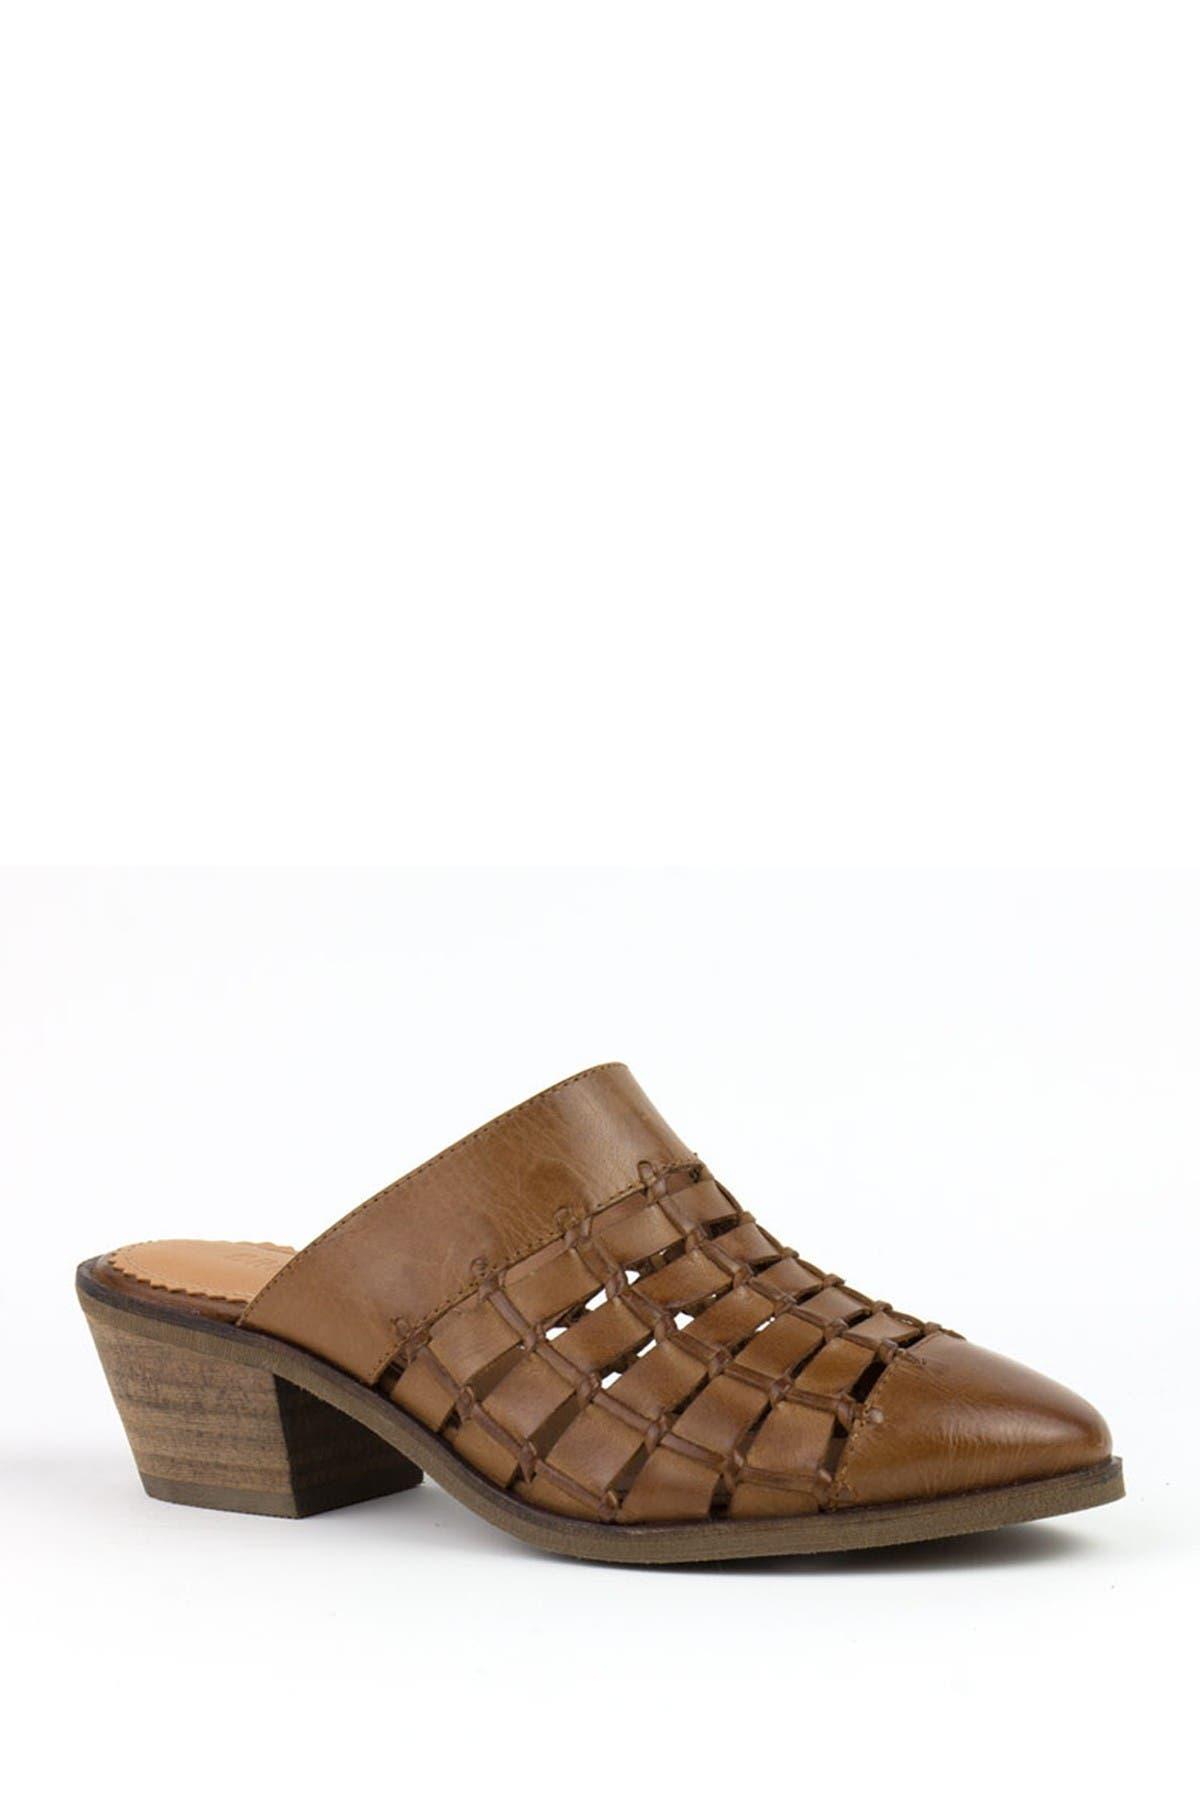 Image of Crevo Luella Leather Block Heel Mule